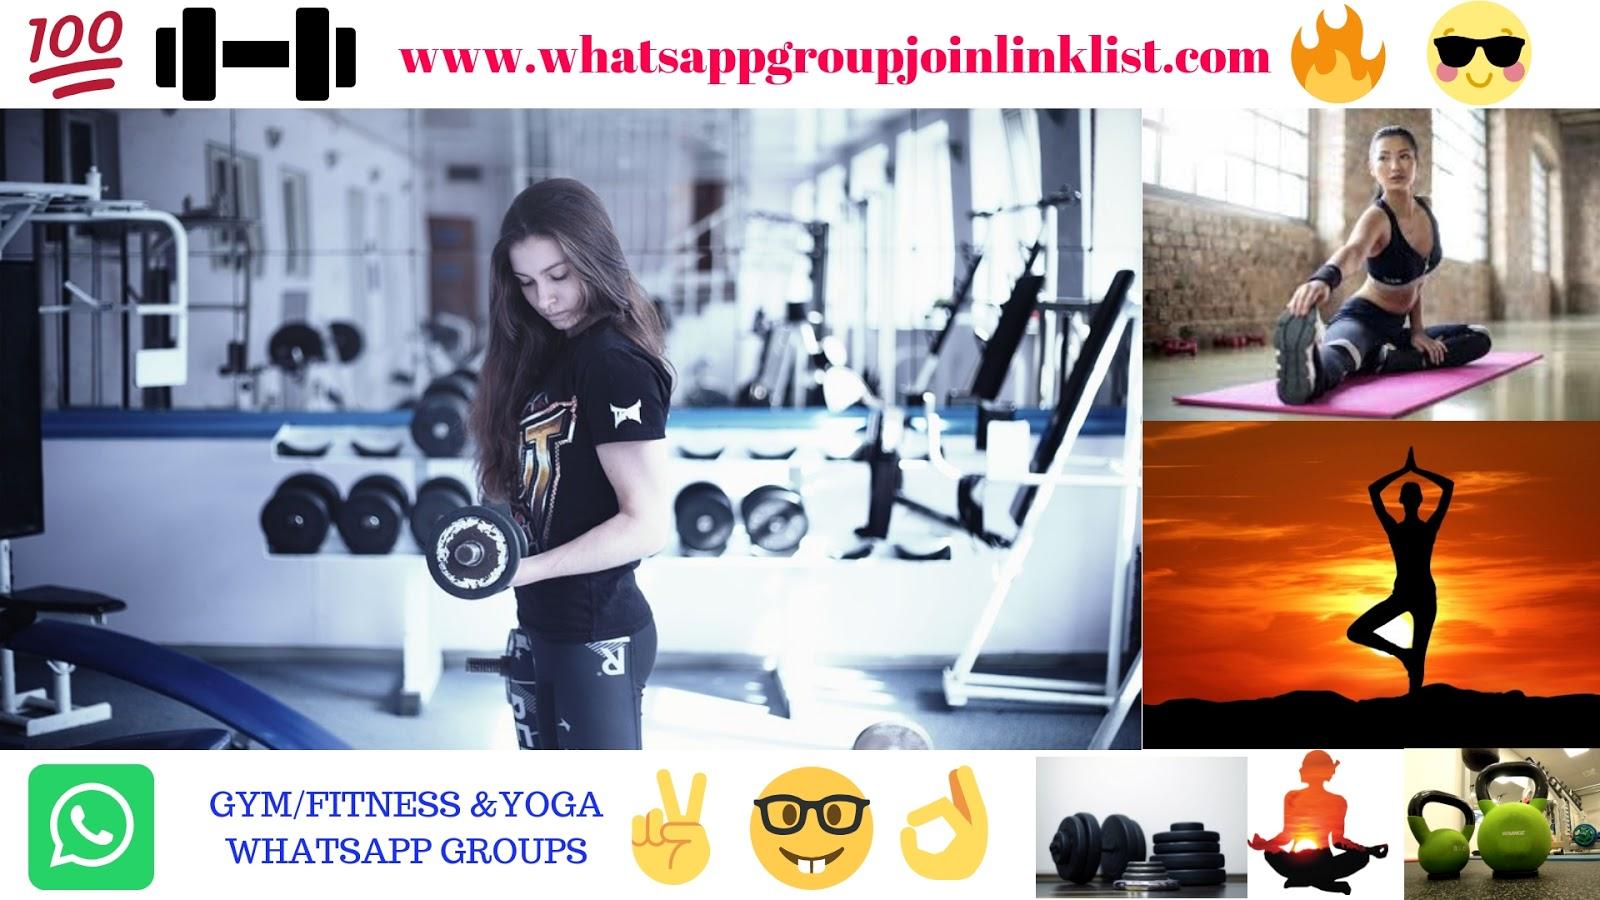 GYM/Fitness&Yoga WhatsApp Group Join Link List:[Health